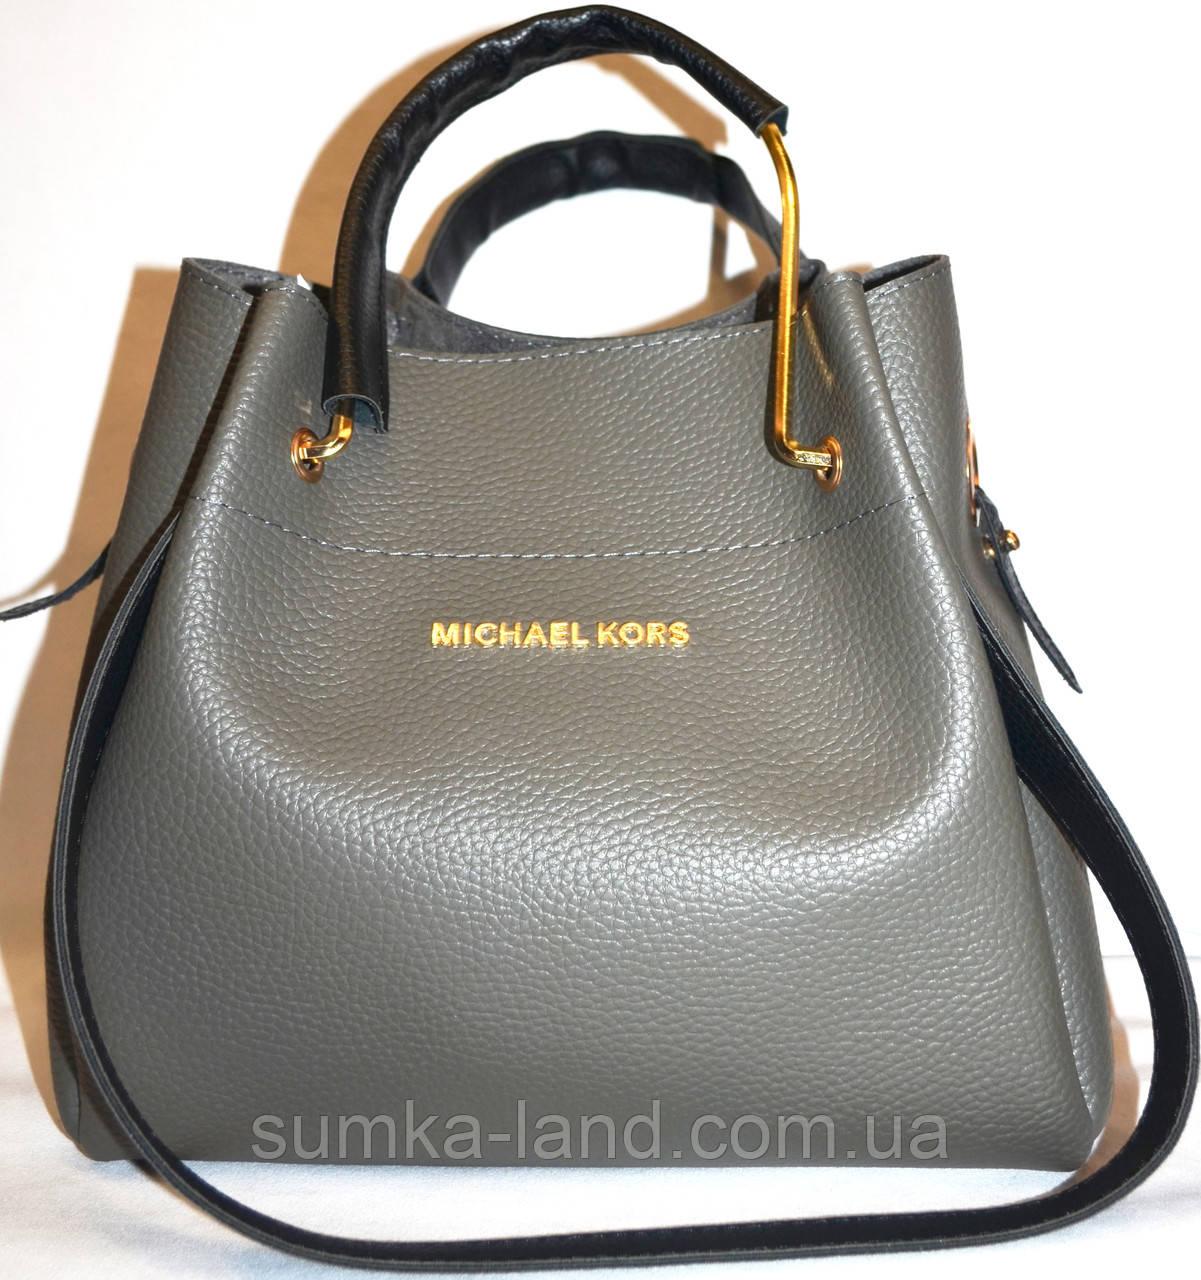 725eb26380c8 Женская элитная сумка Michael Kors 28*26 (серый), цена 427 грн ...